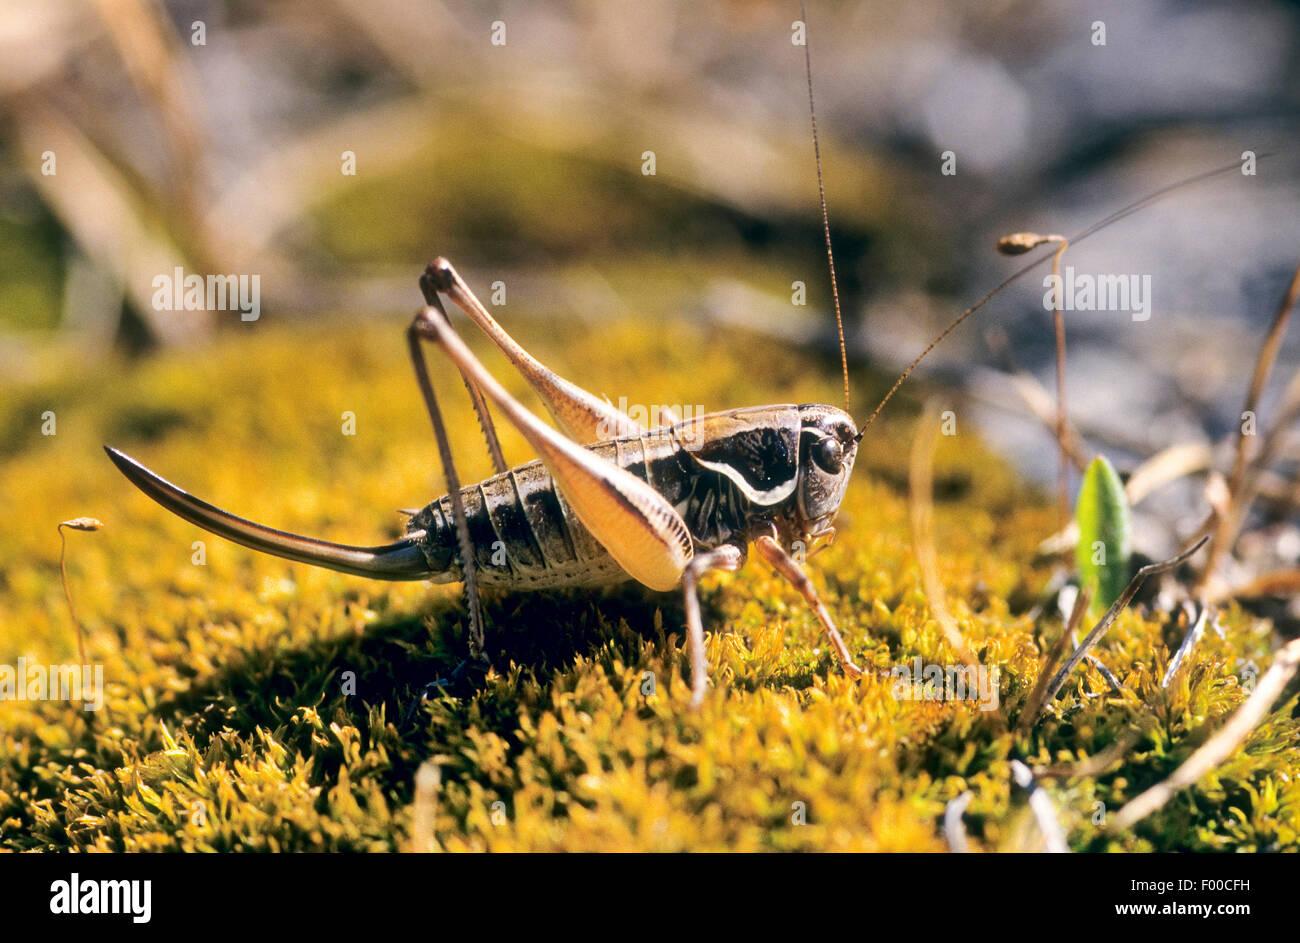 Serbian Pygmy Bush-cricket, Serbian Pygmy Bush cricket (Anterastes serbicus, Anterastes petkovskii), female - Stock Image